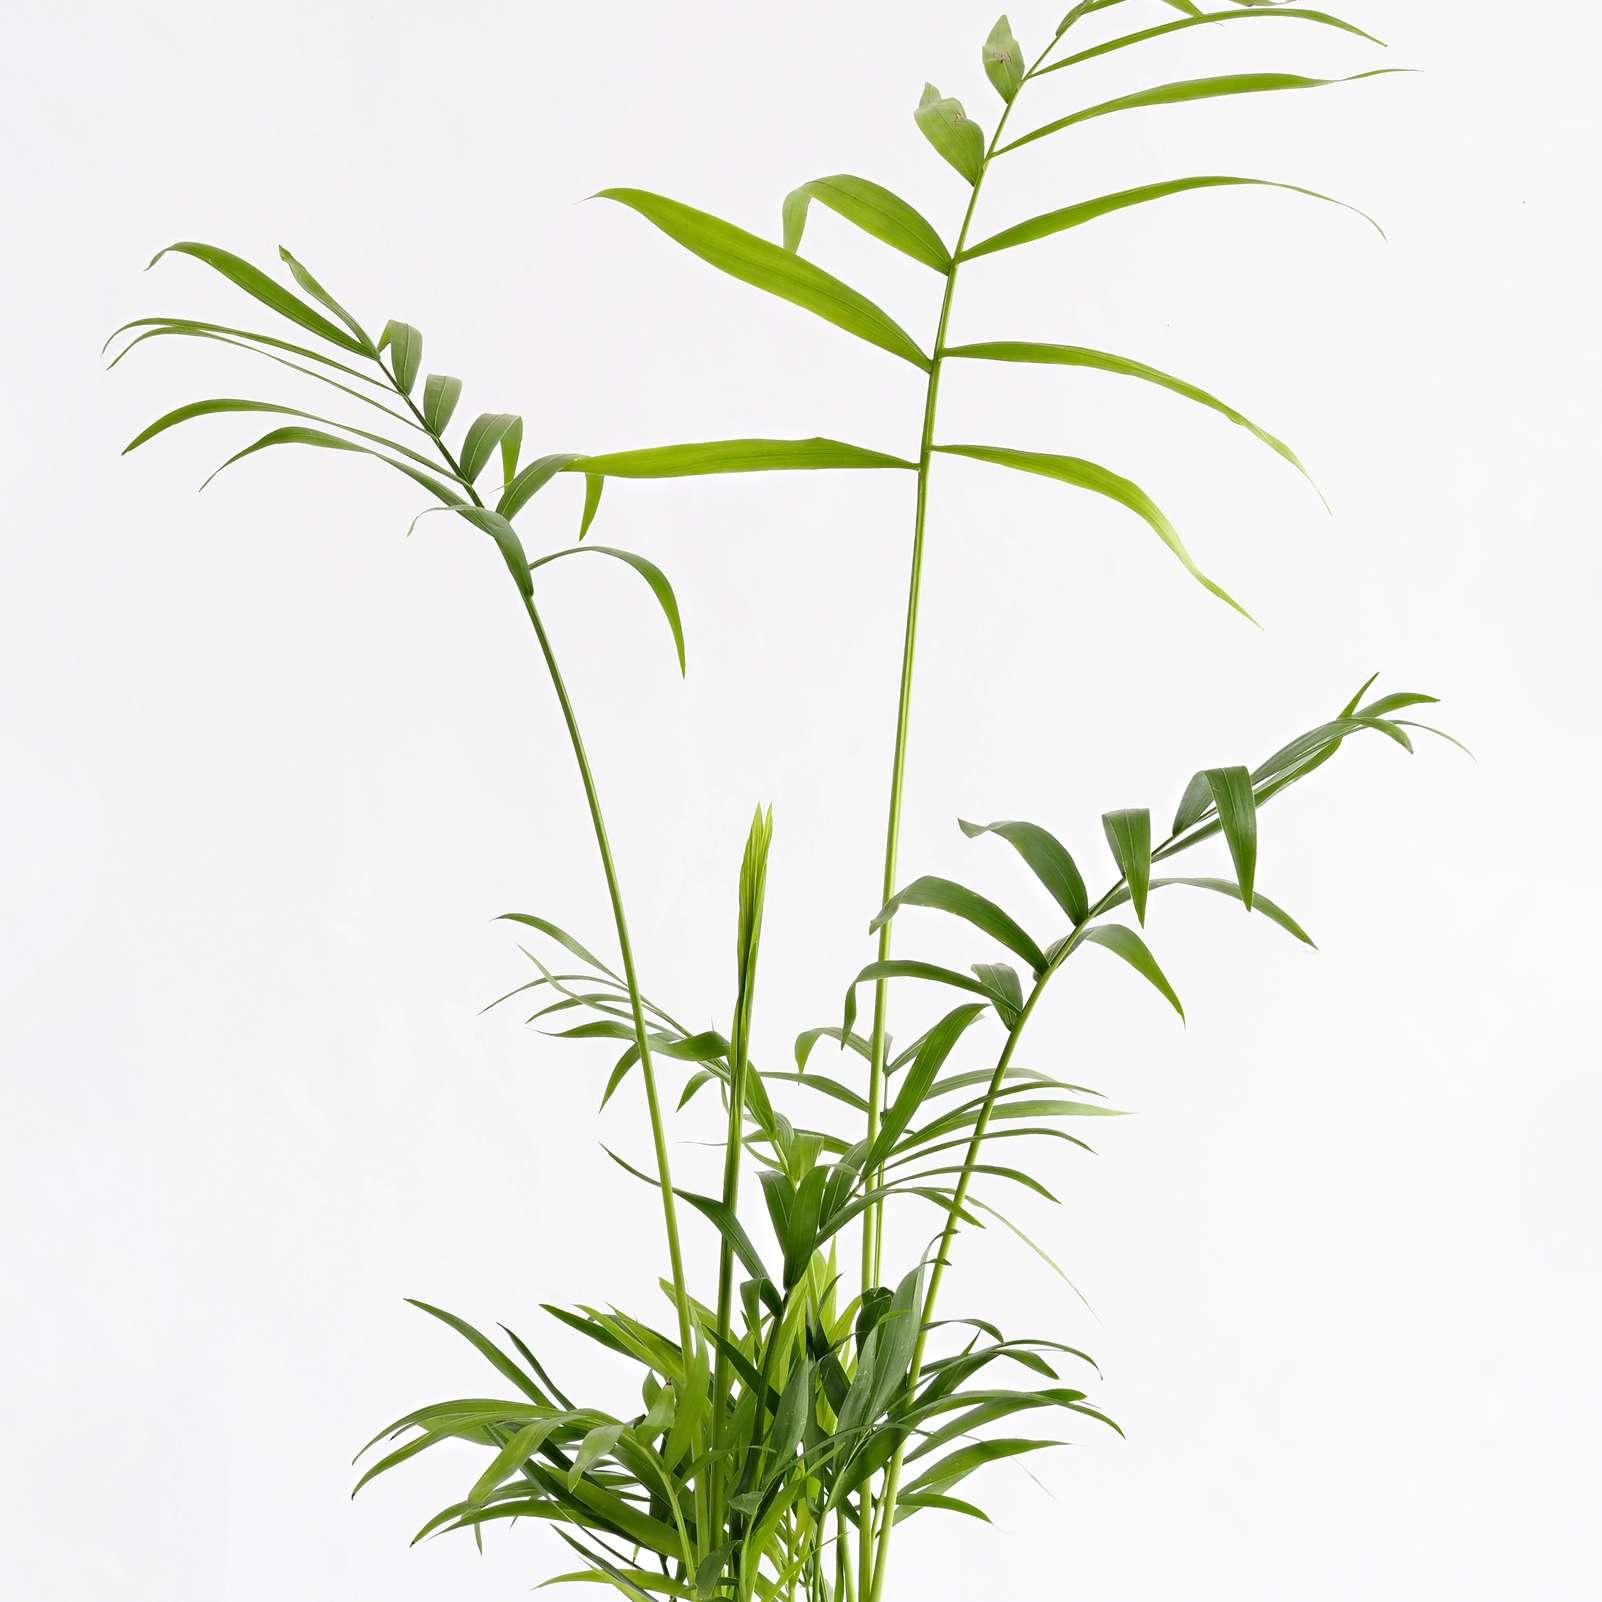 Areca palm leaves on white background.